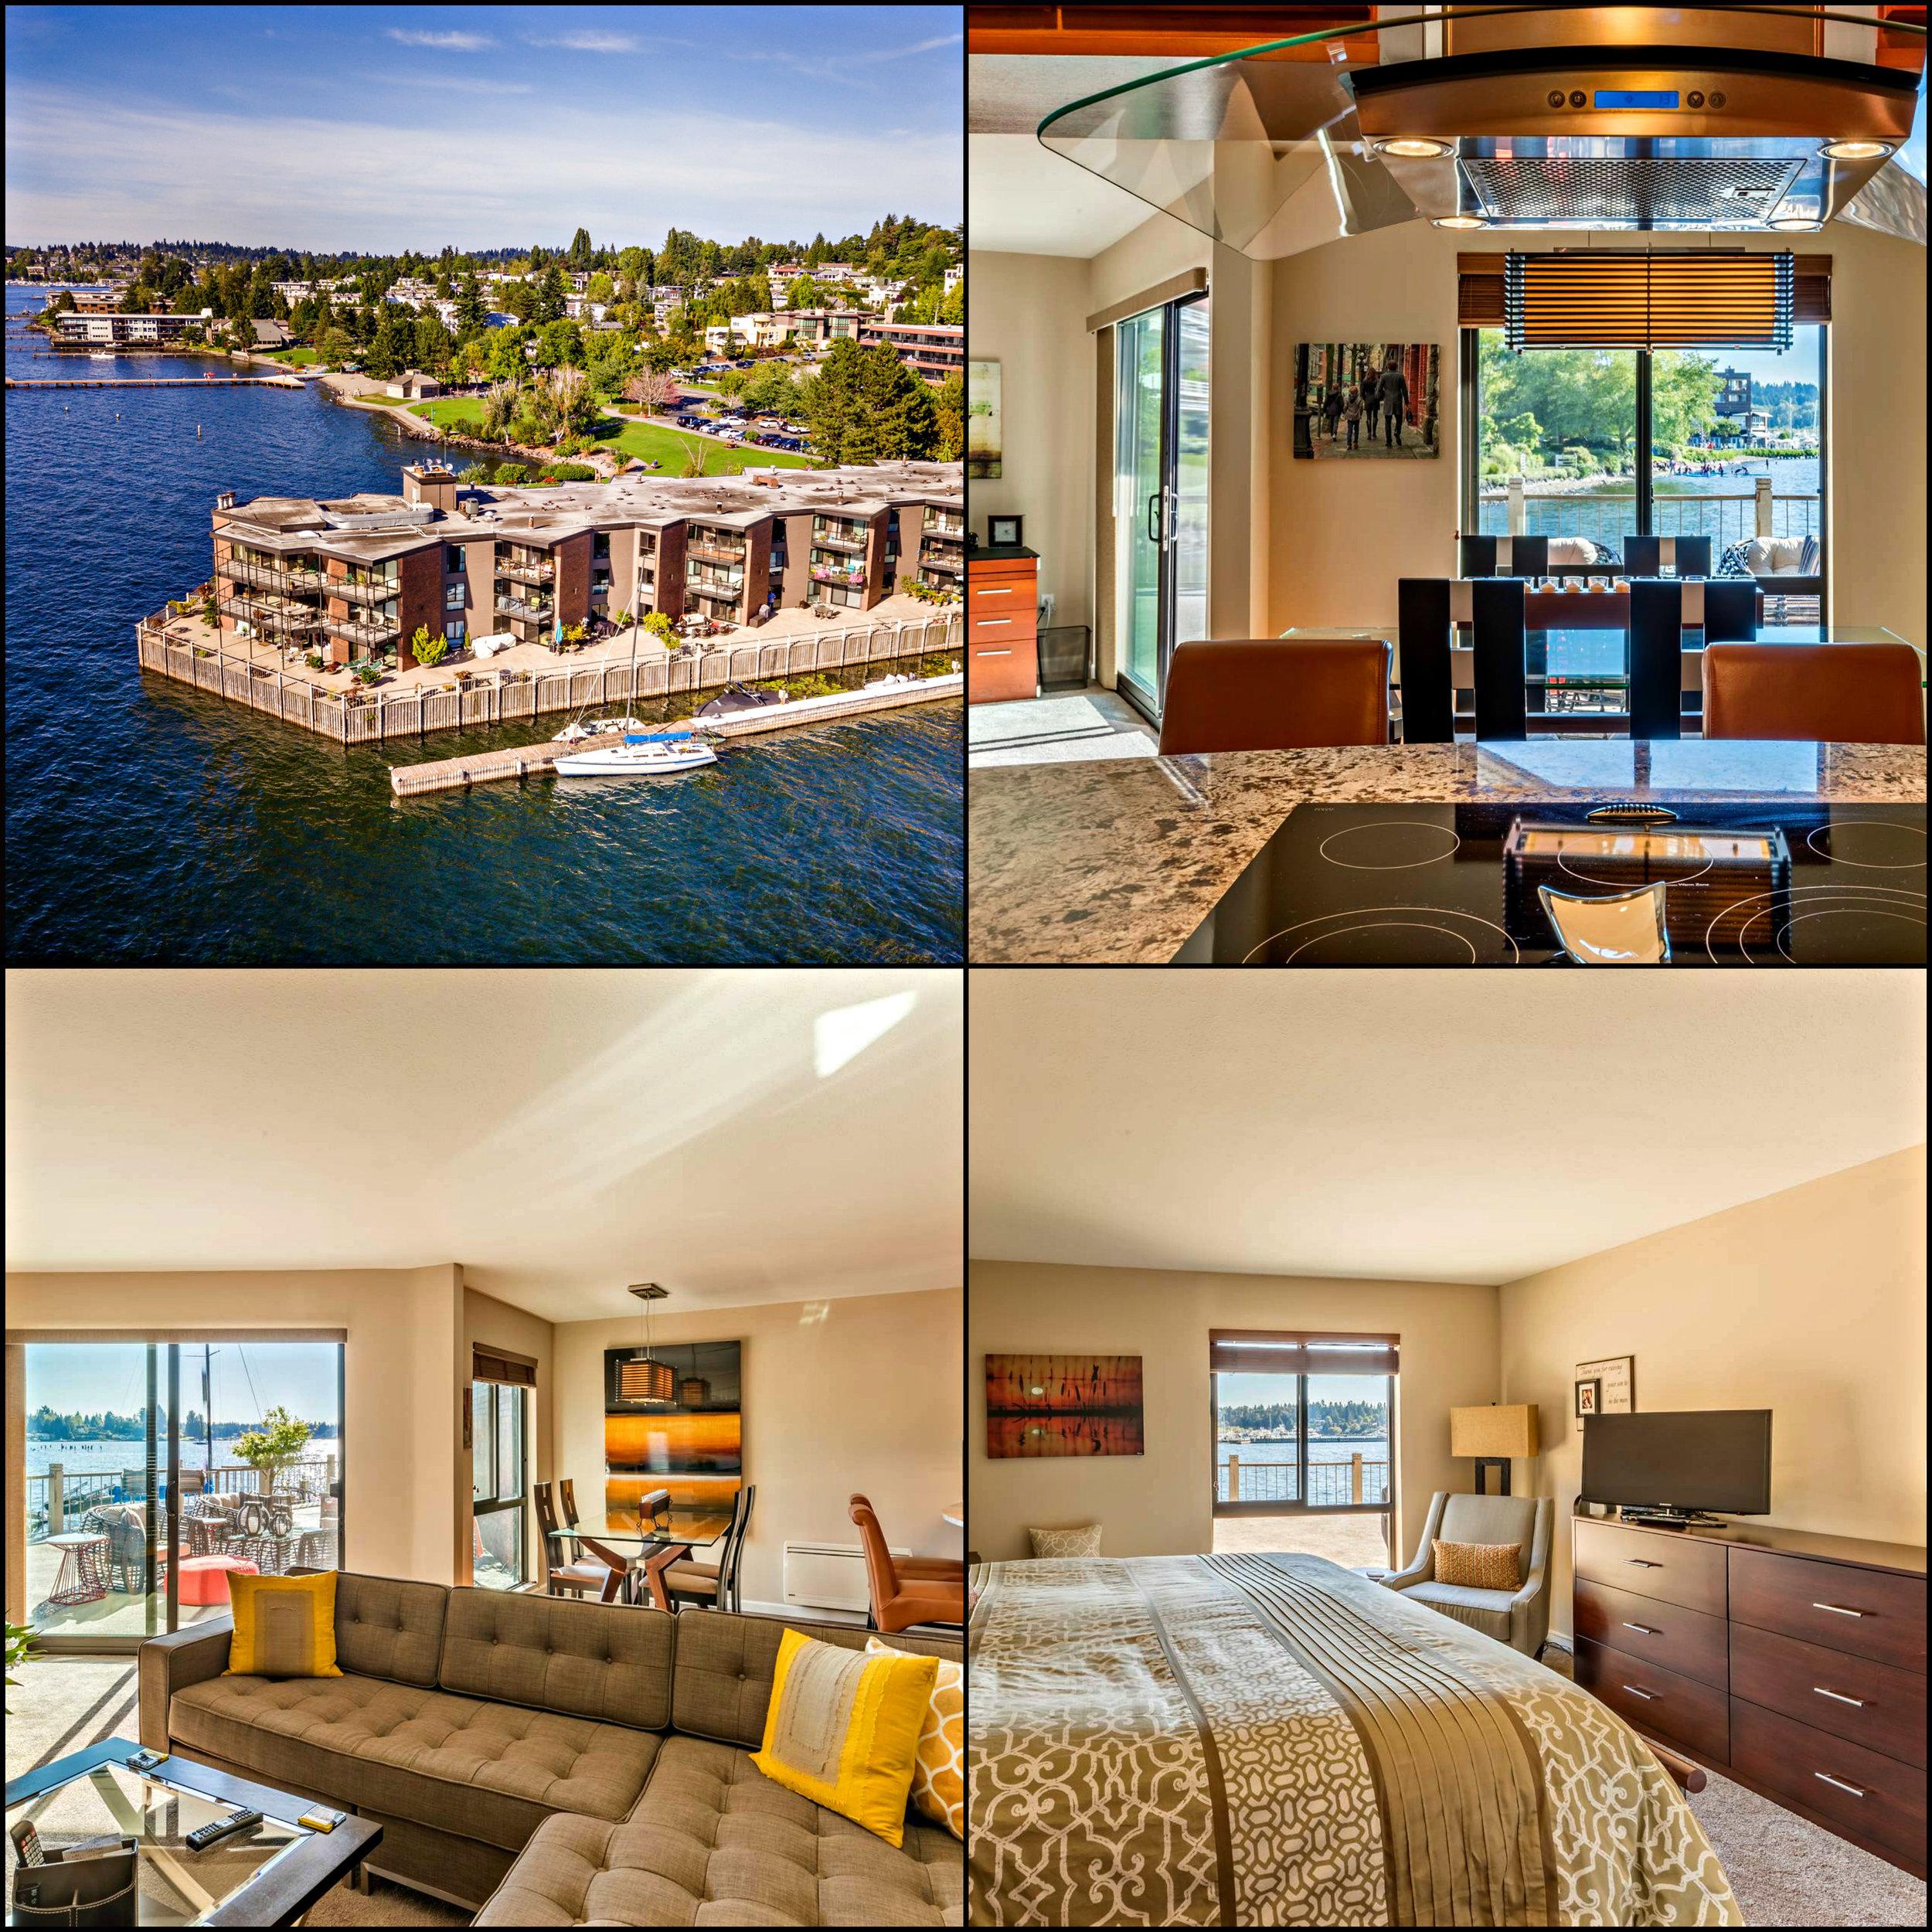 Carmen Halstrom 5535 Lake Washington Blvd collage.jpg